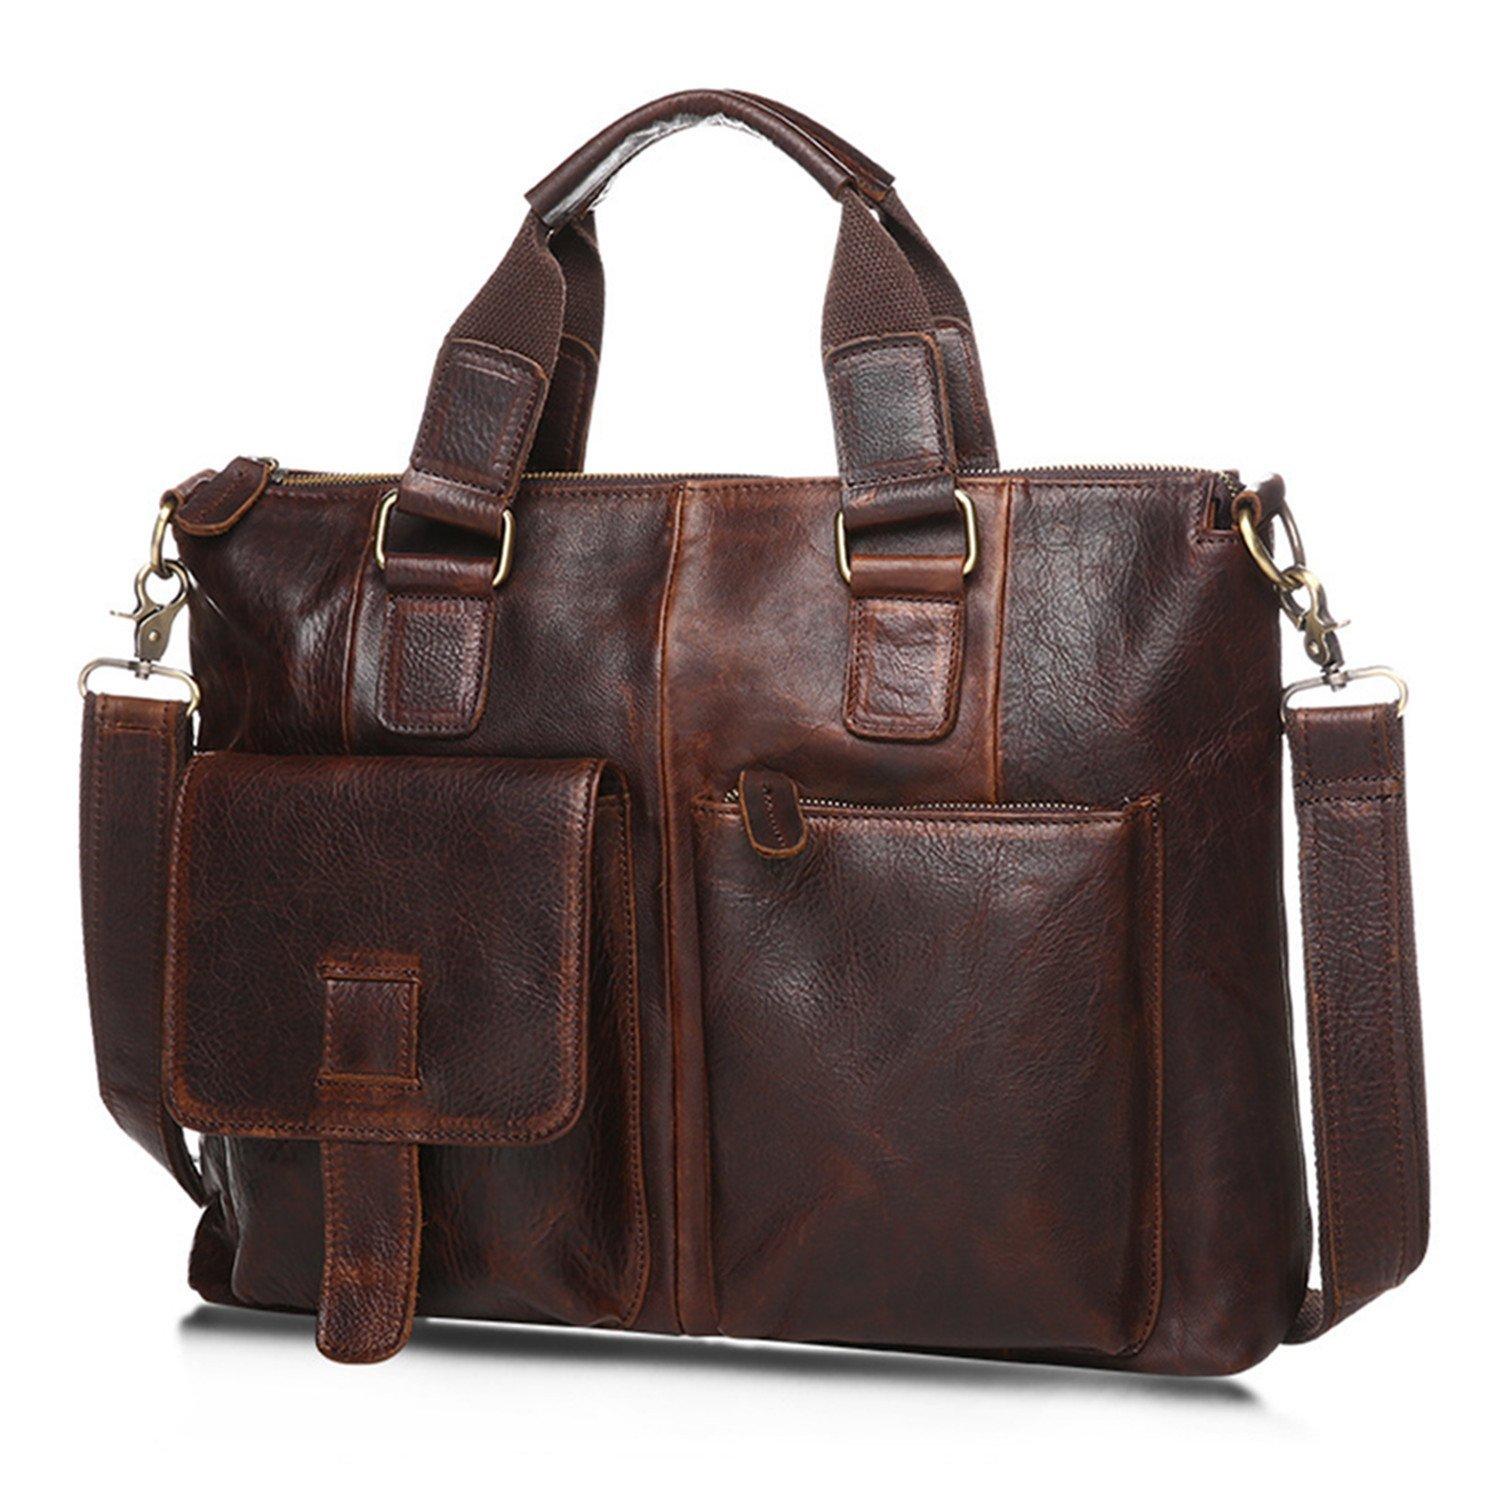 DRF Leather Laptop Messenger Bag Business Office Briefcase Satchel for Men BG-262 (Coffee)